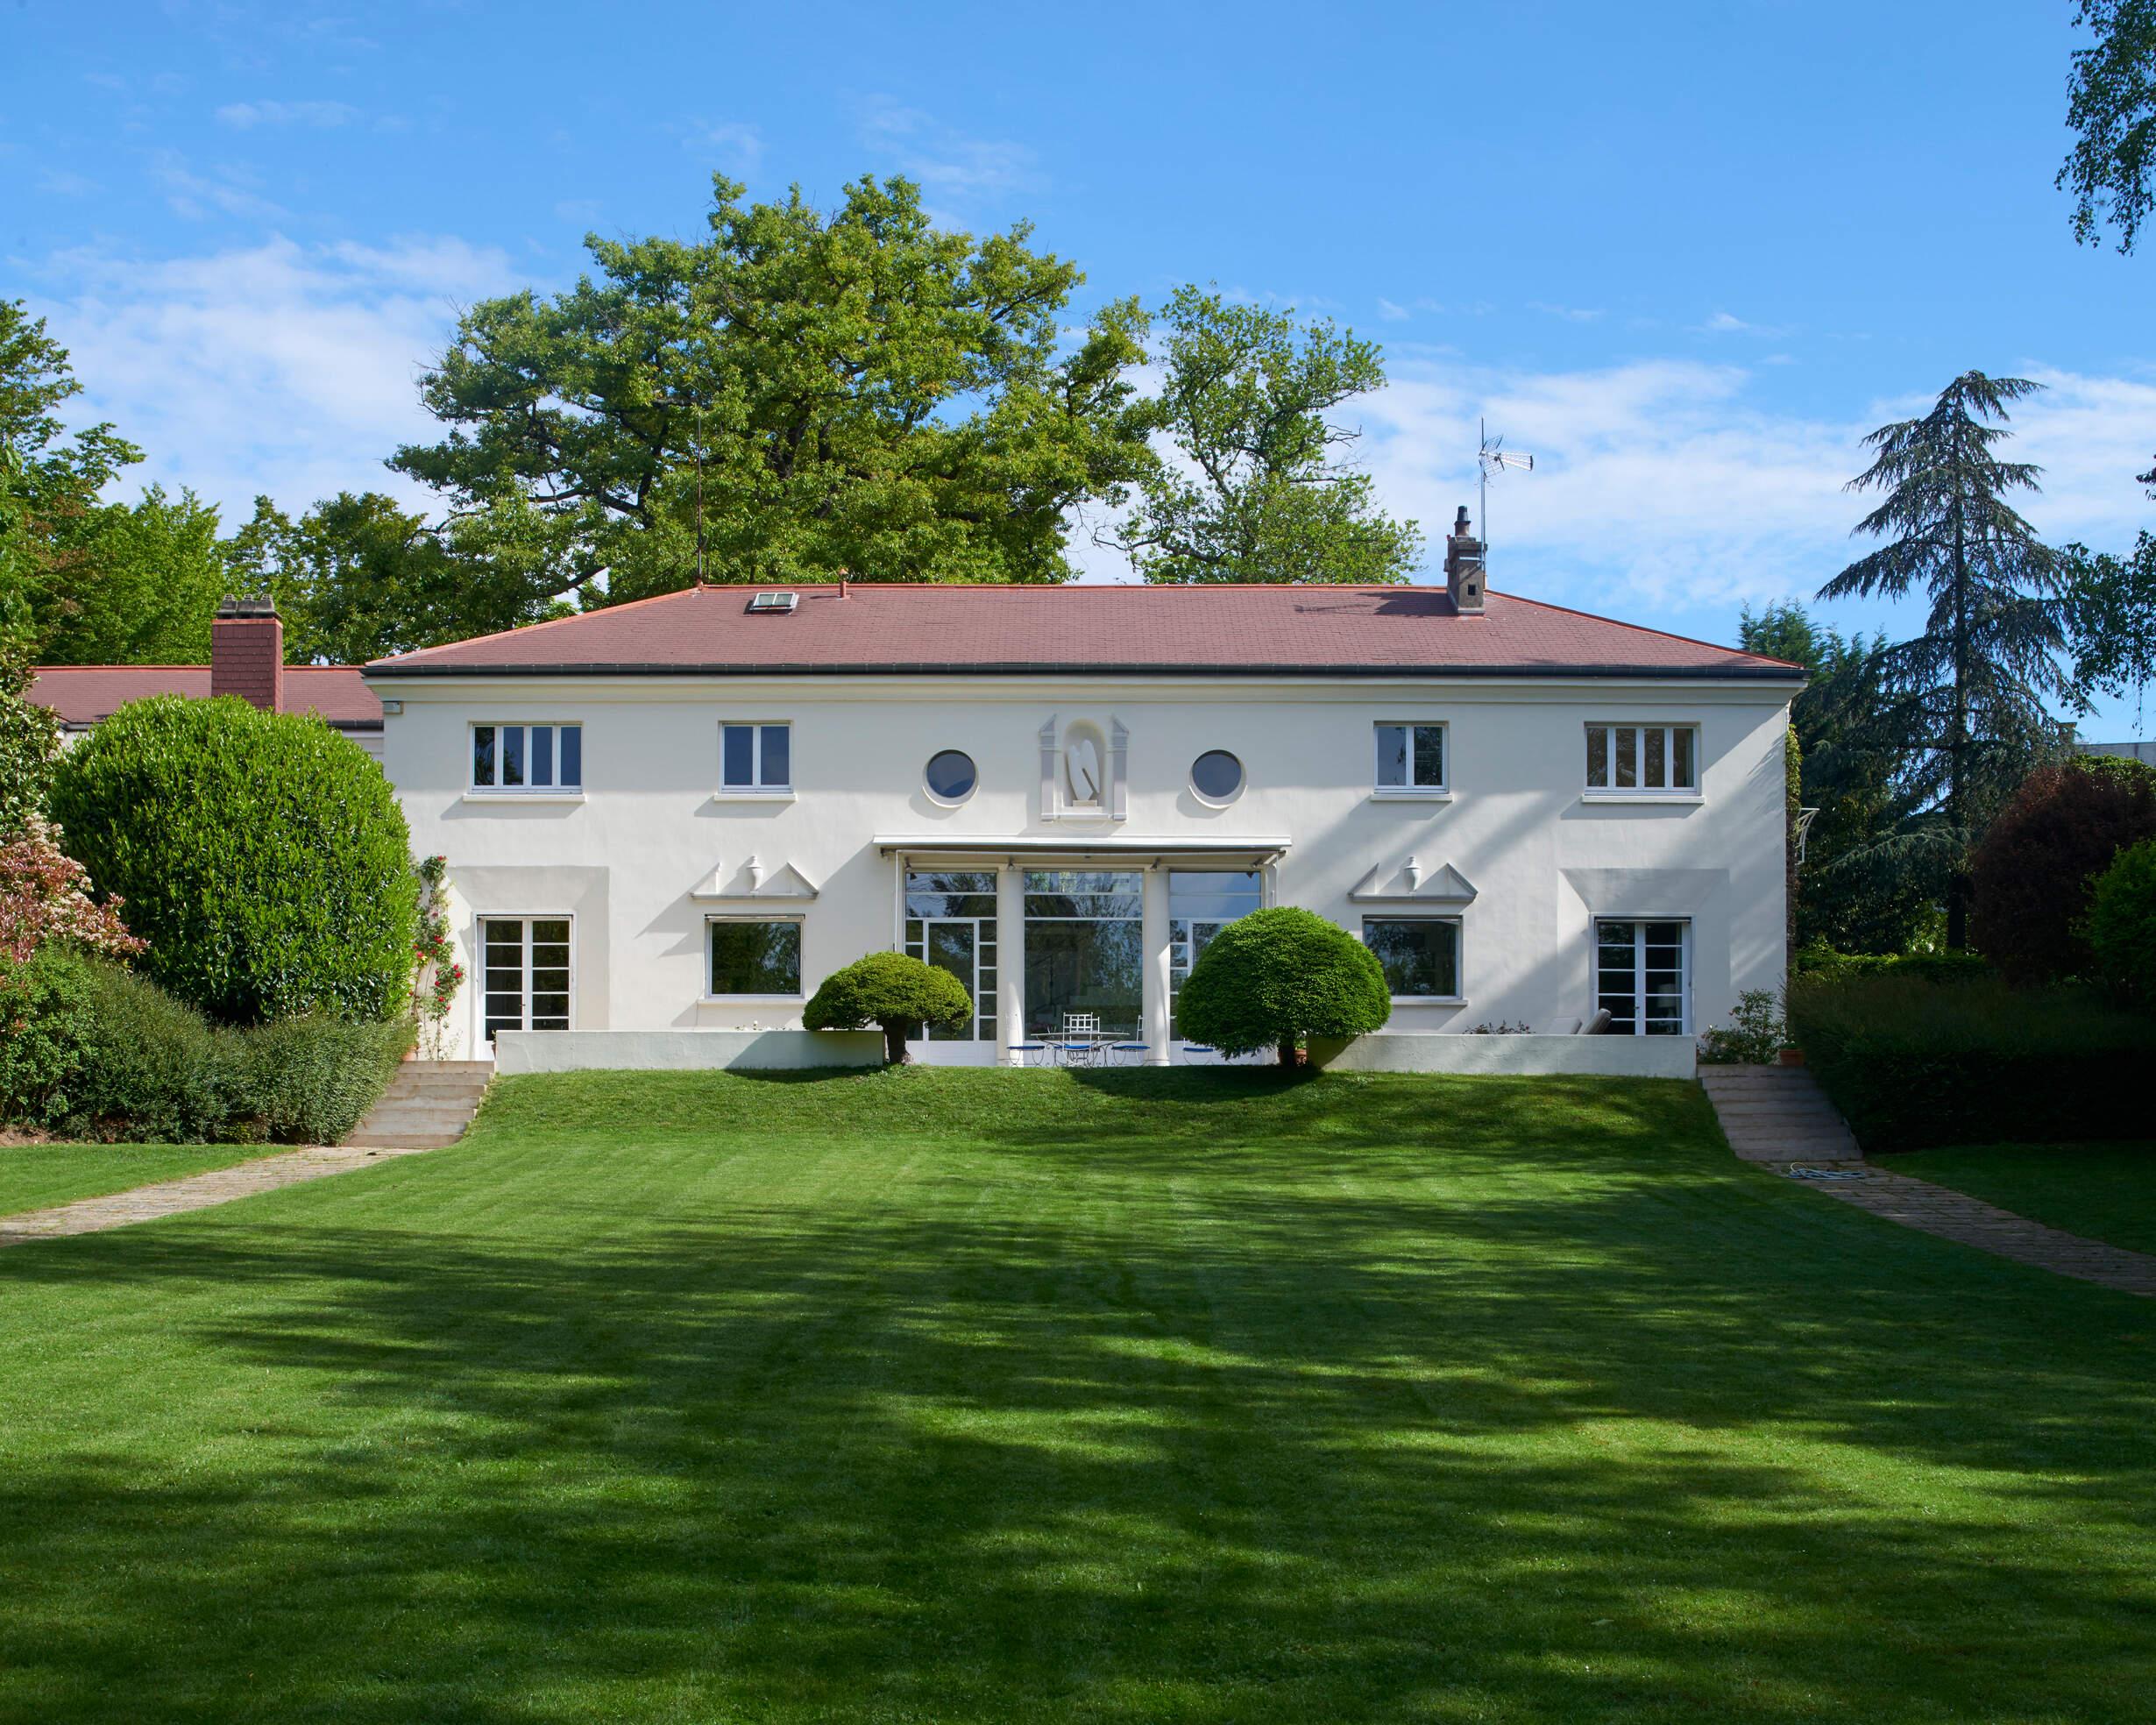 Maison Italienne in Ile-de-France  Le Collectionist